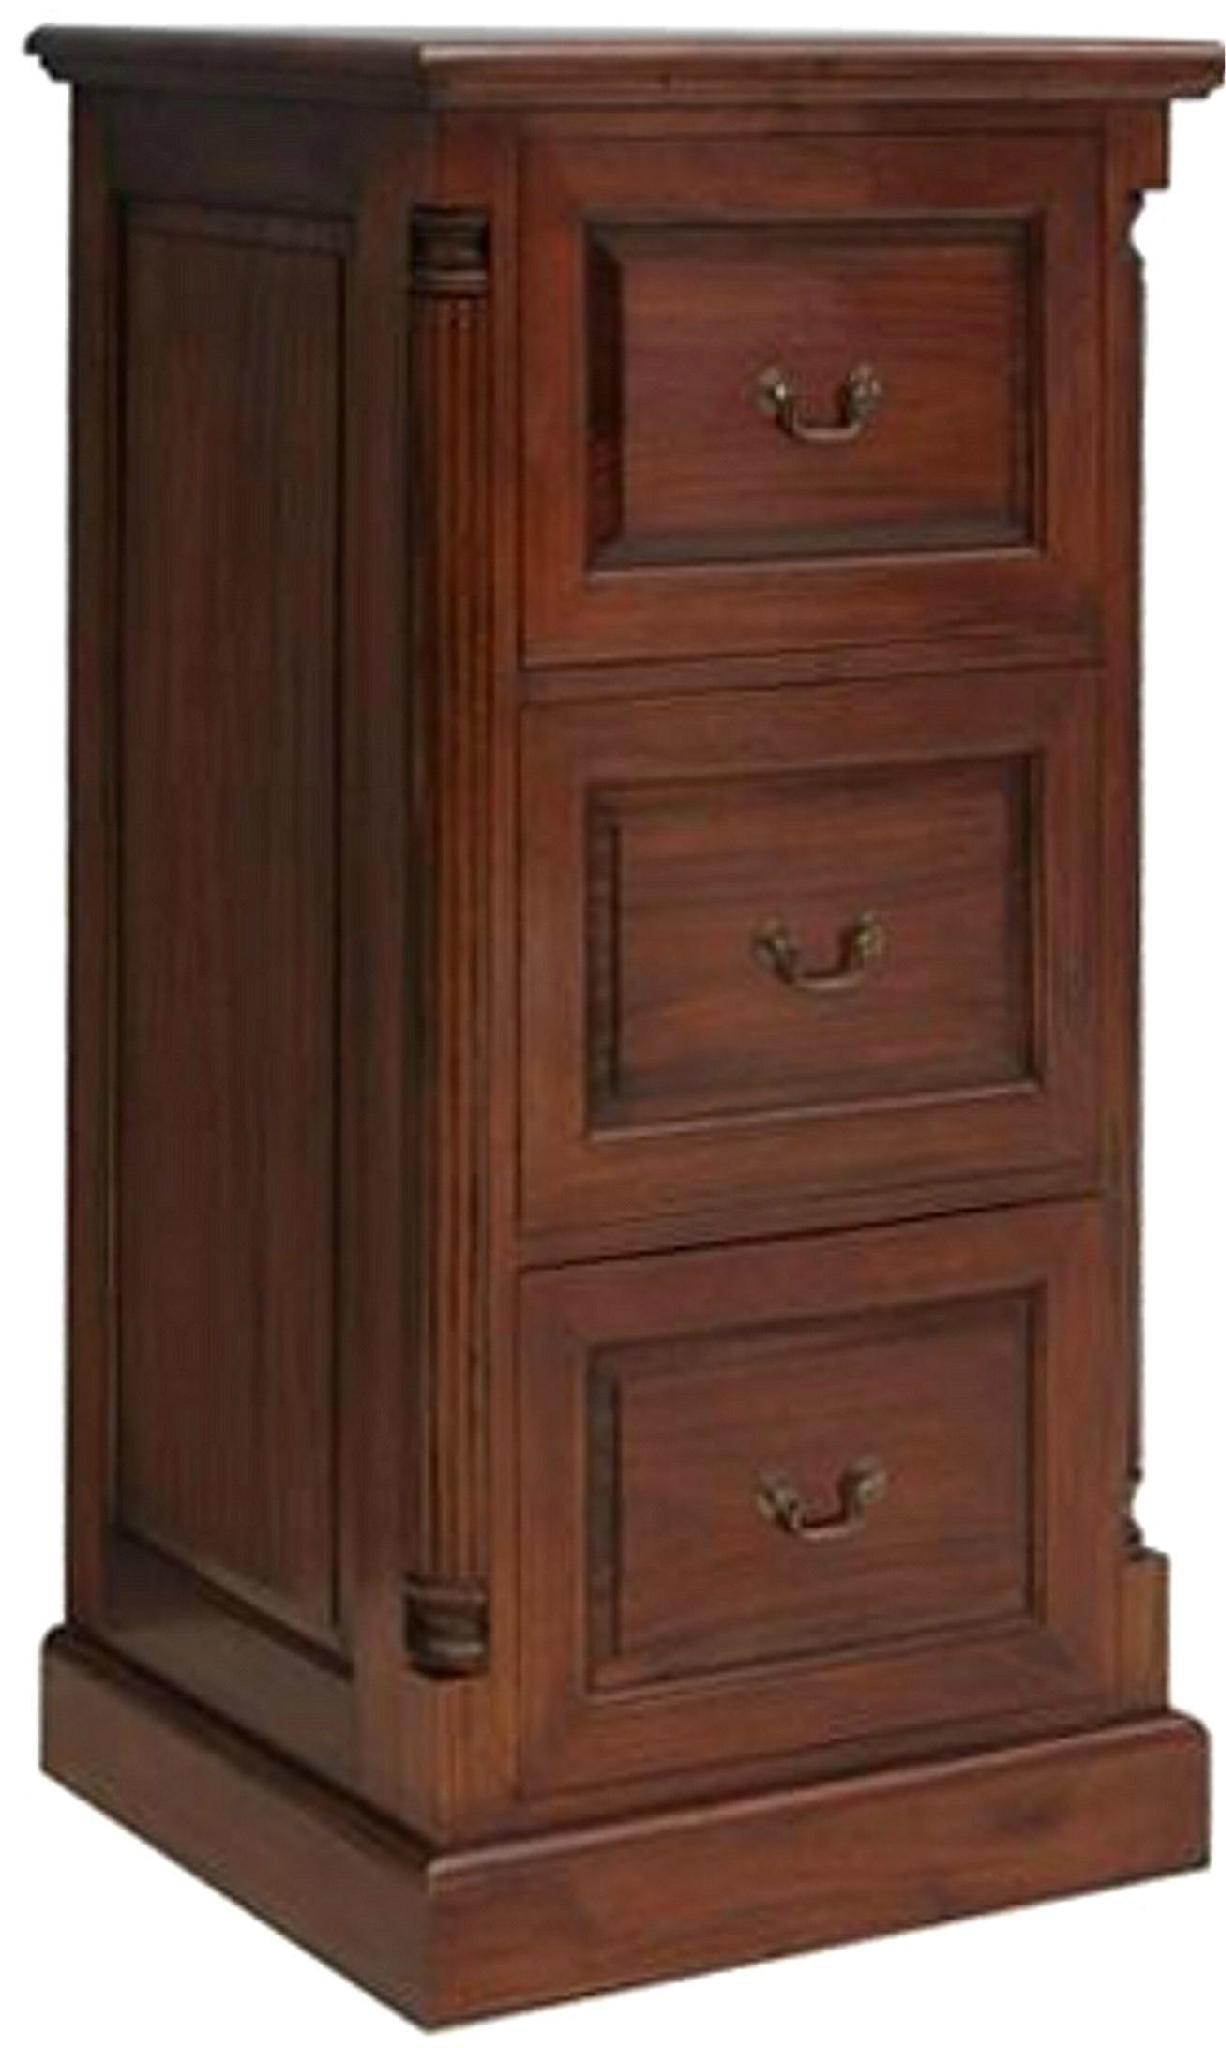 Classic Antique Dark Cherry 3 Drawer File Cabinet - WD-3726 ...